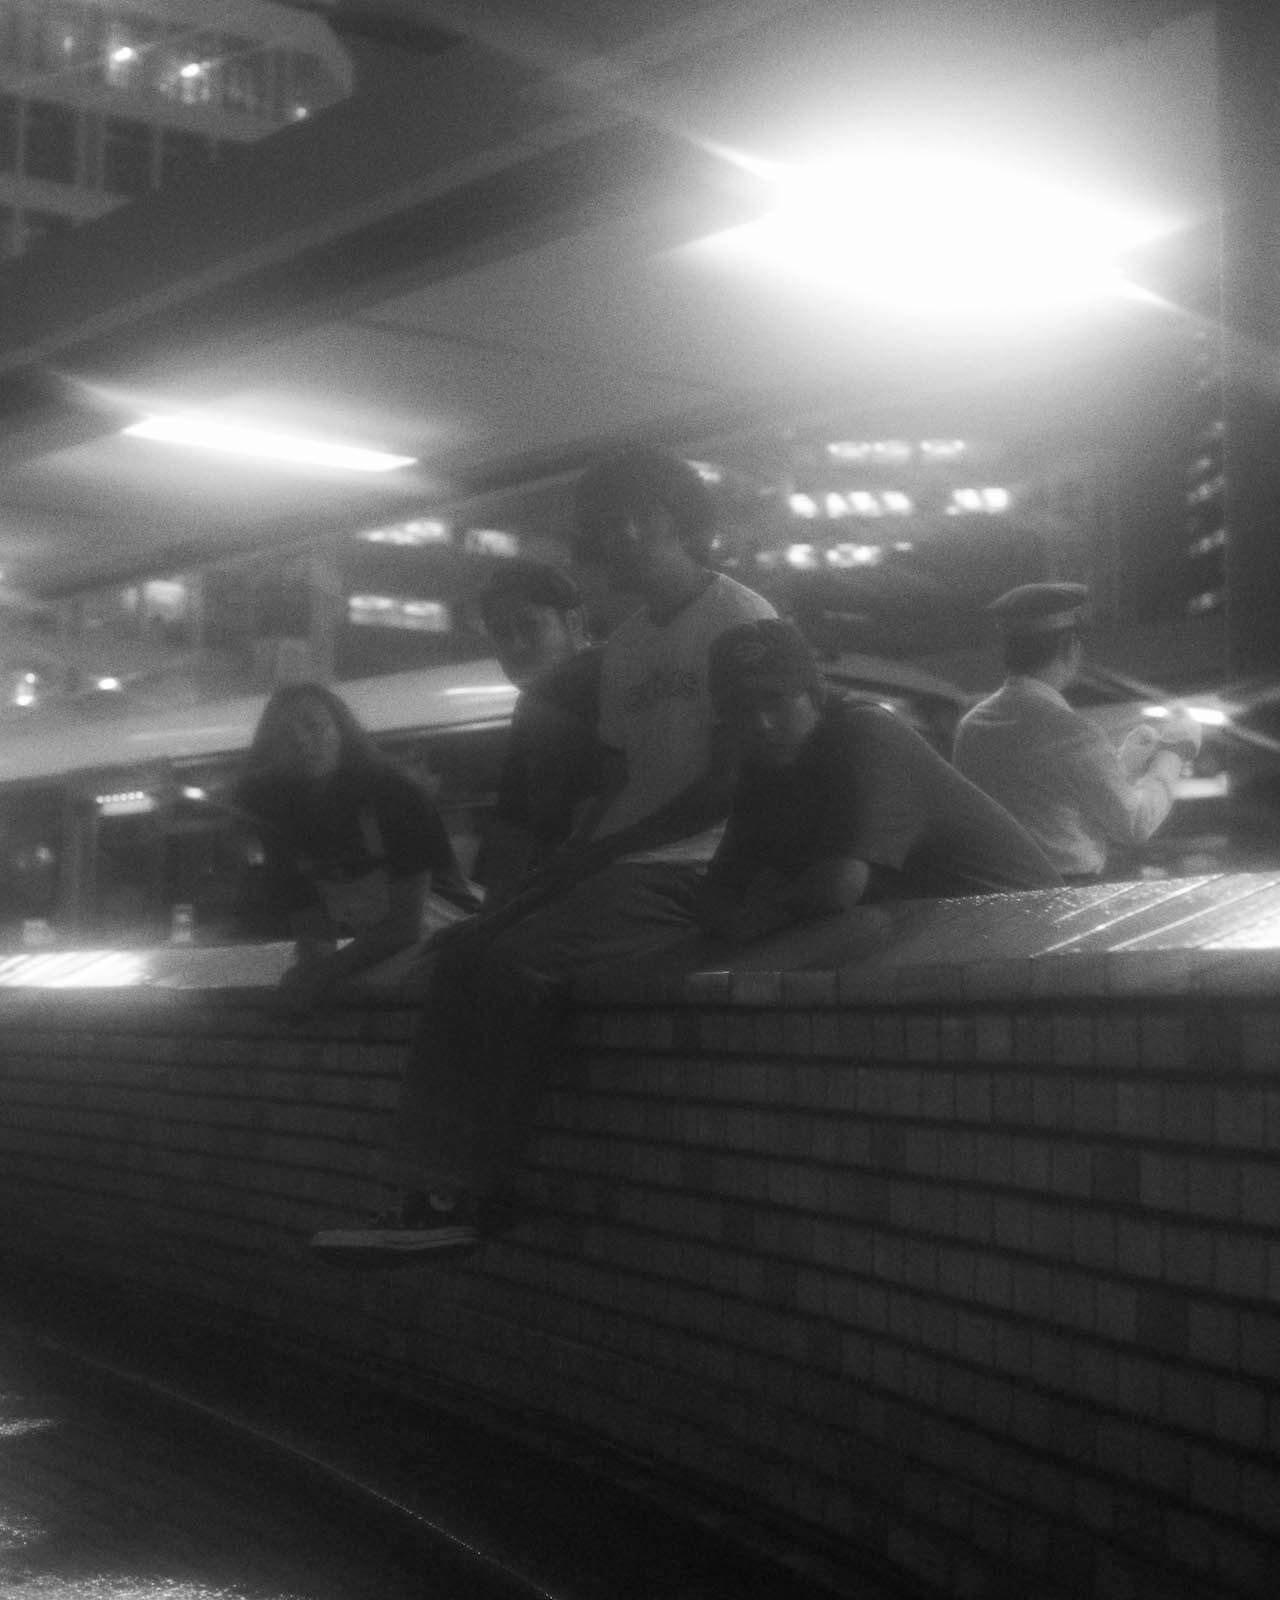 TENDOUJI×フジロック|東京オルタナシーン屈指の愛されバンドに訊く、フジロック初出演の意気込み interview190722-tendouji-9